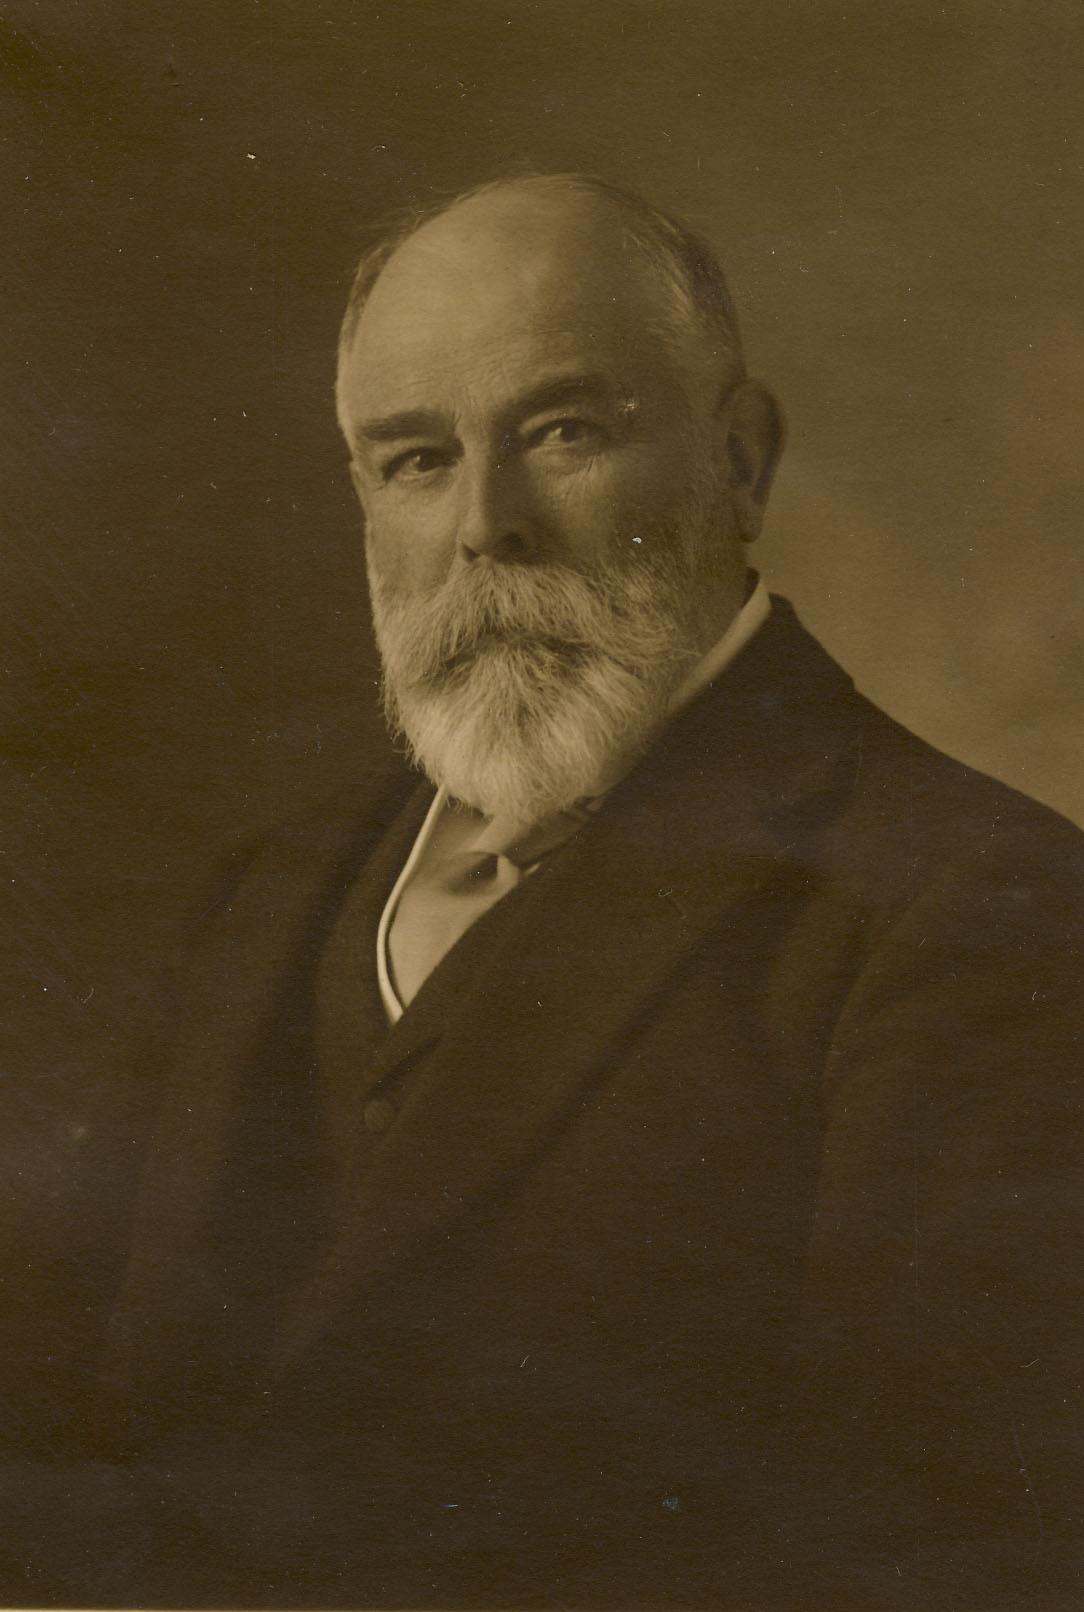 Volume XIV (1911-1920